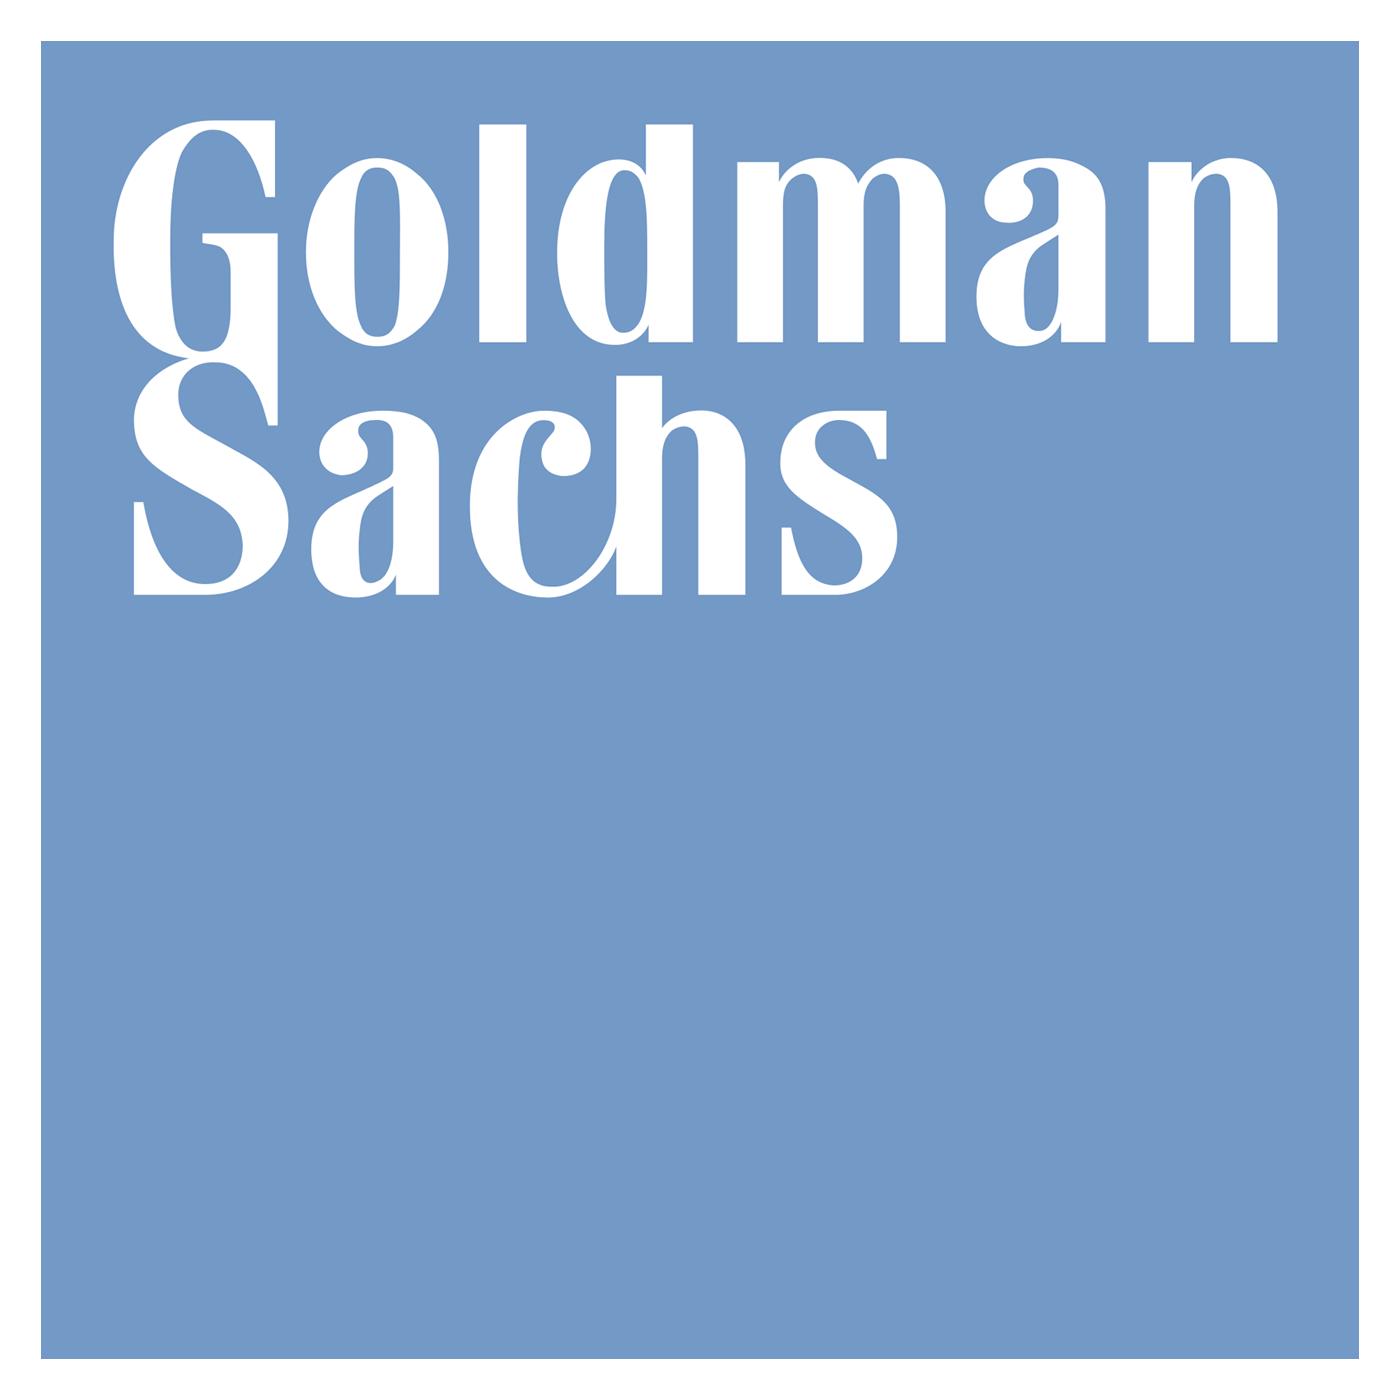 Goldman Sachs Logo Banks Logo Investment Banking Goldman Sachs